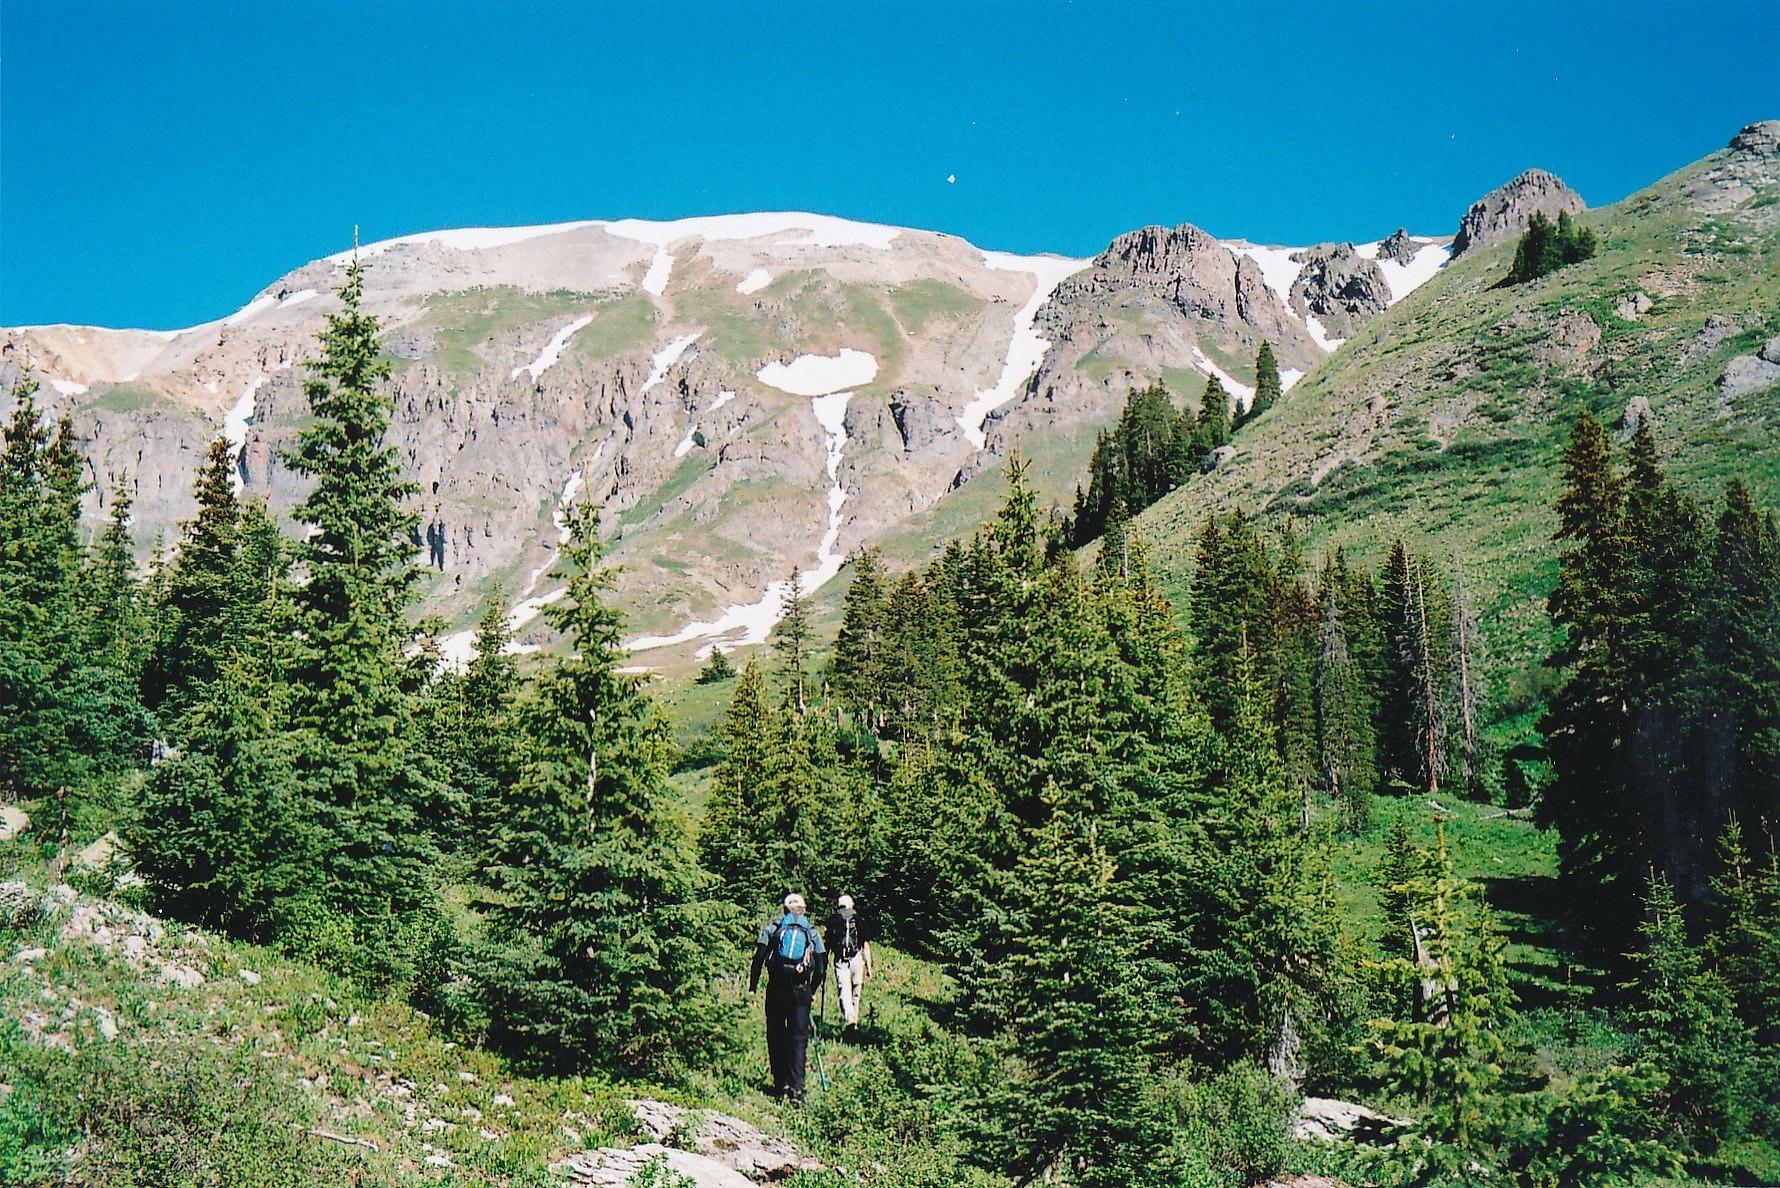 Hayden Mountain, South - 13,206